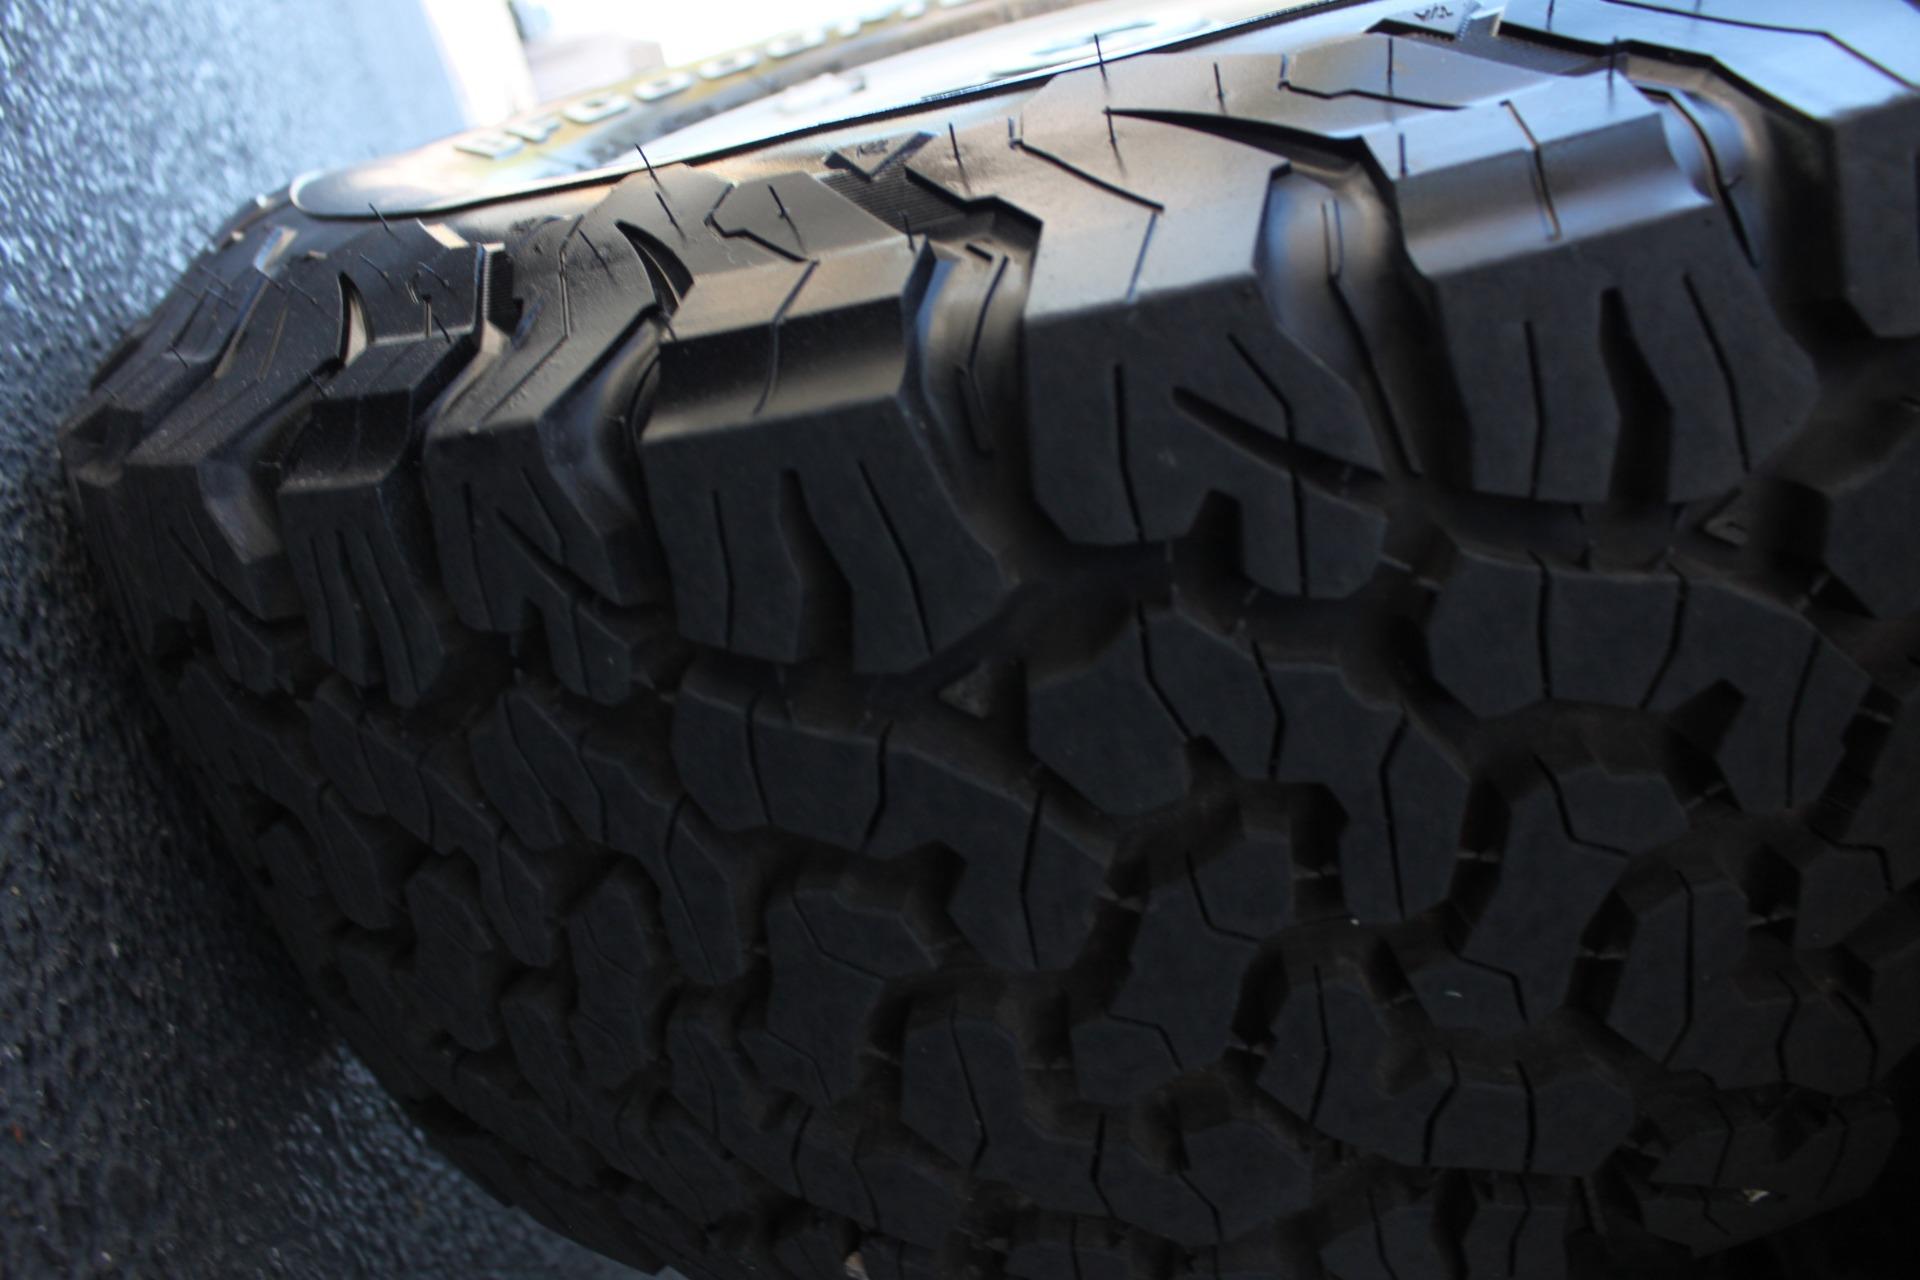 Used-1983-Jeep-Cherokee-Chief-4WD-Jaguar